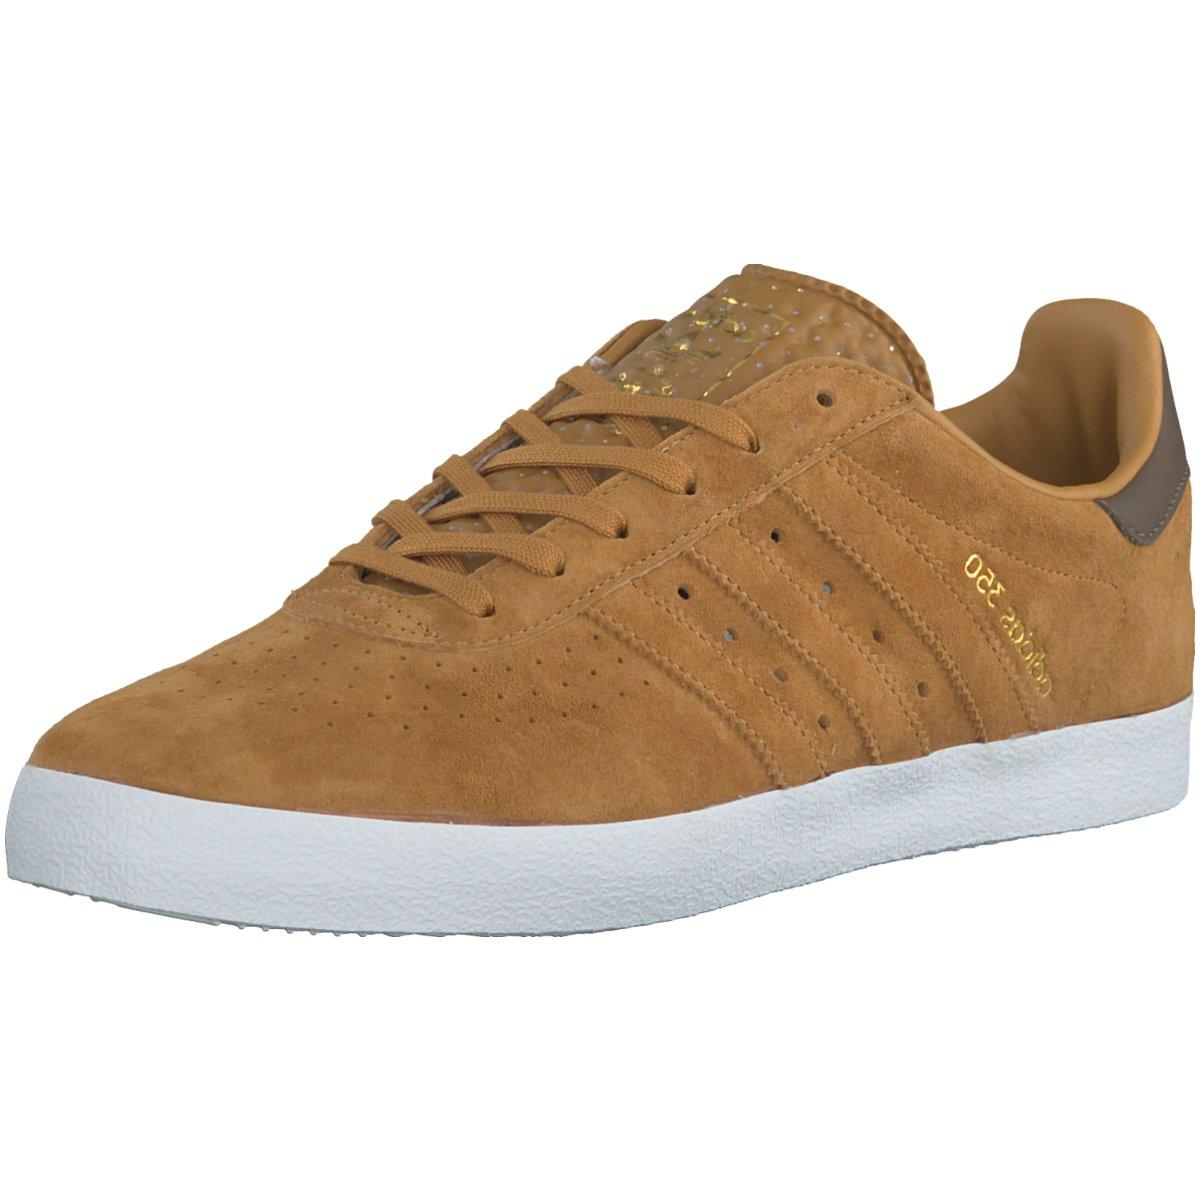 S2K adidas Originals Herren Turnschuhe 350 Turnschuhe Herren Schuhe braun BB5291